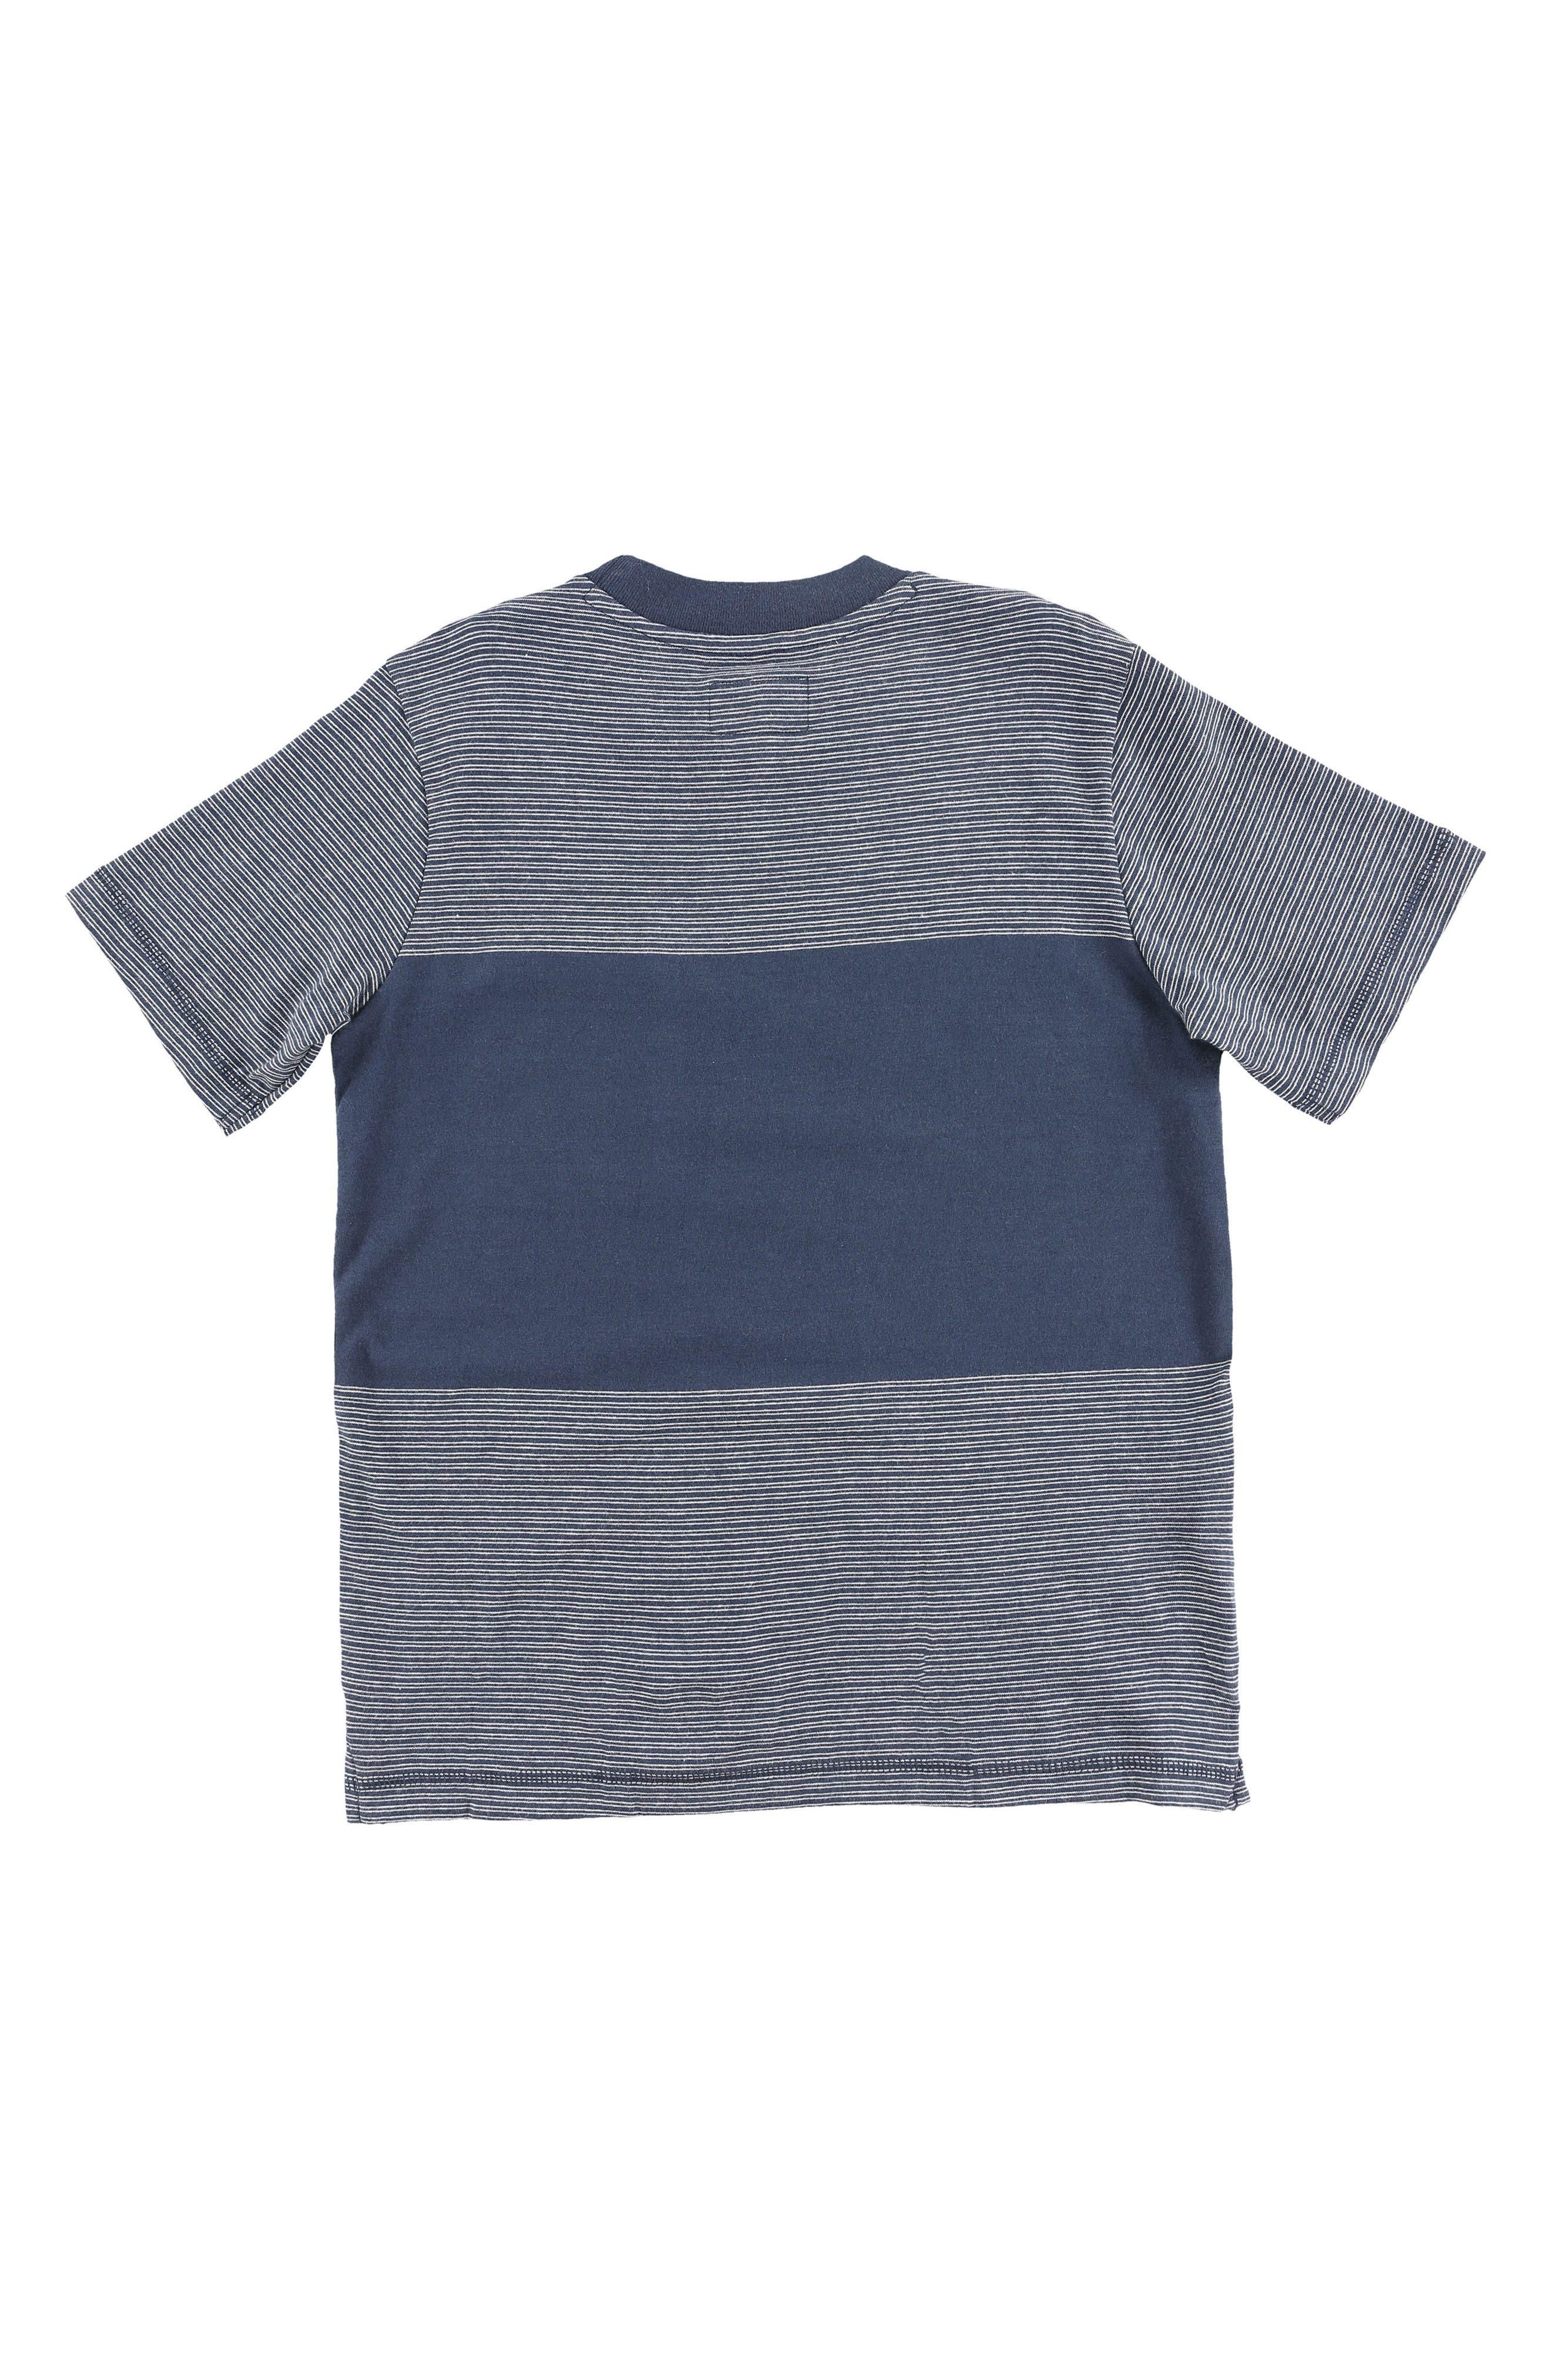 Bernardo T-Shirt,                             Alternate thumbnail 2, color,                             Navy